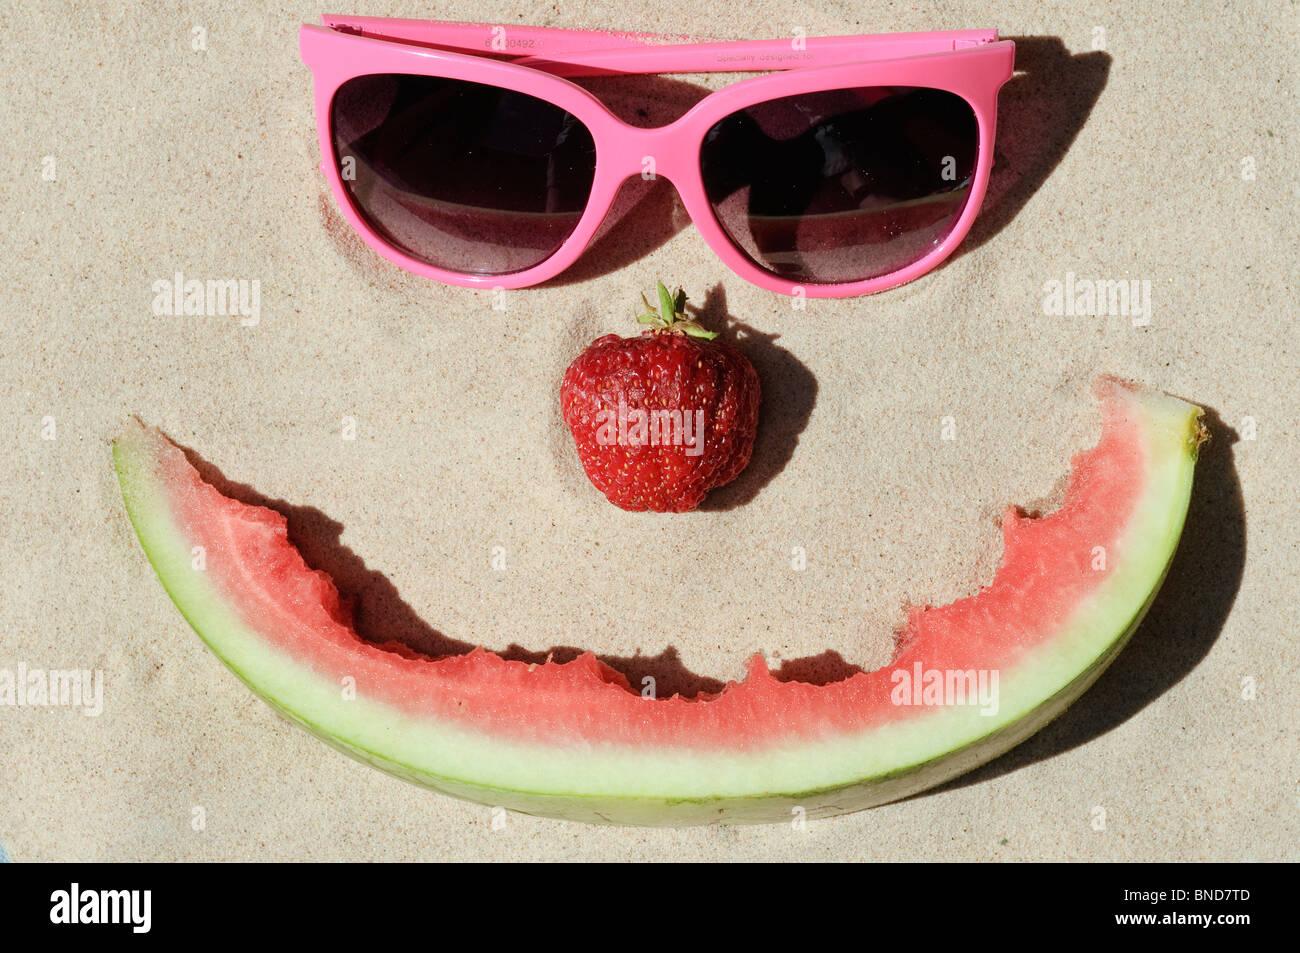 Symbolic happy summer face on a sunny sandy beach - Stock Image